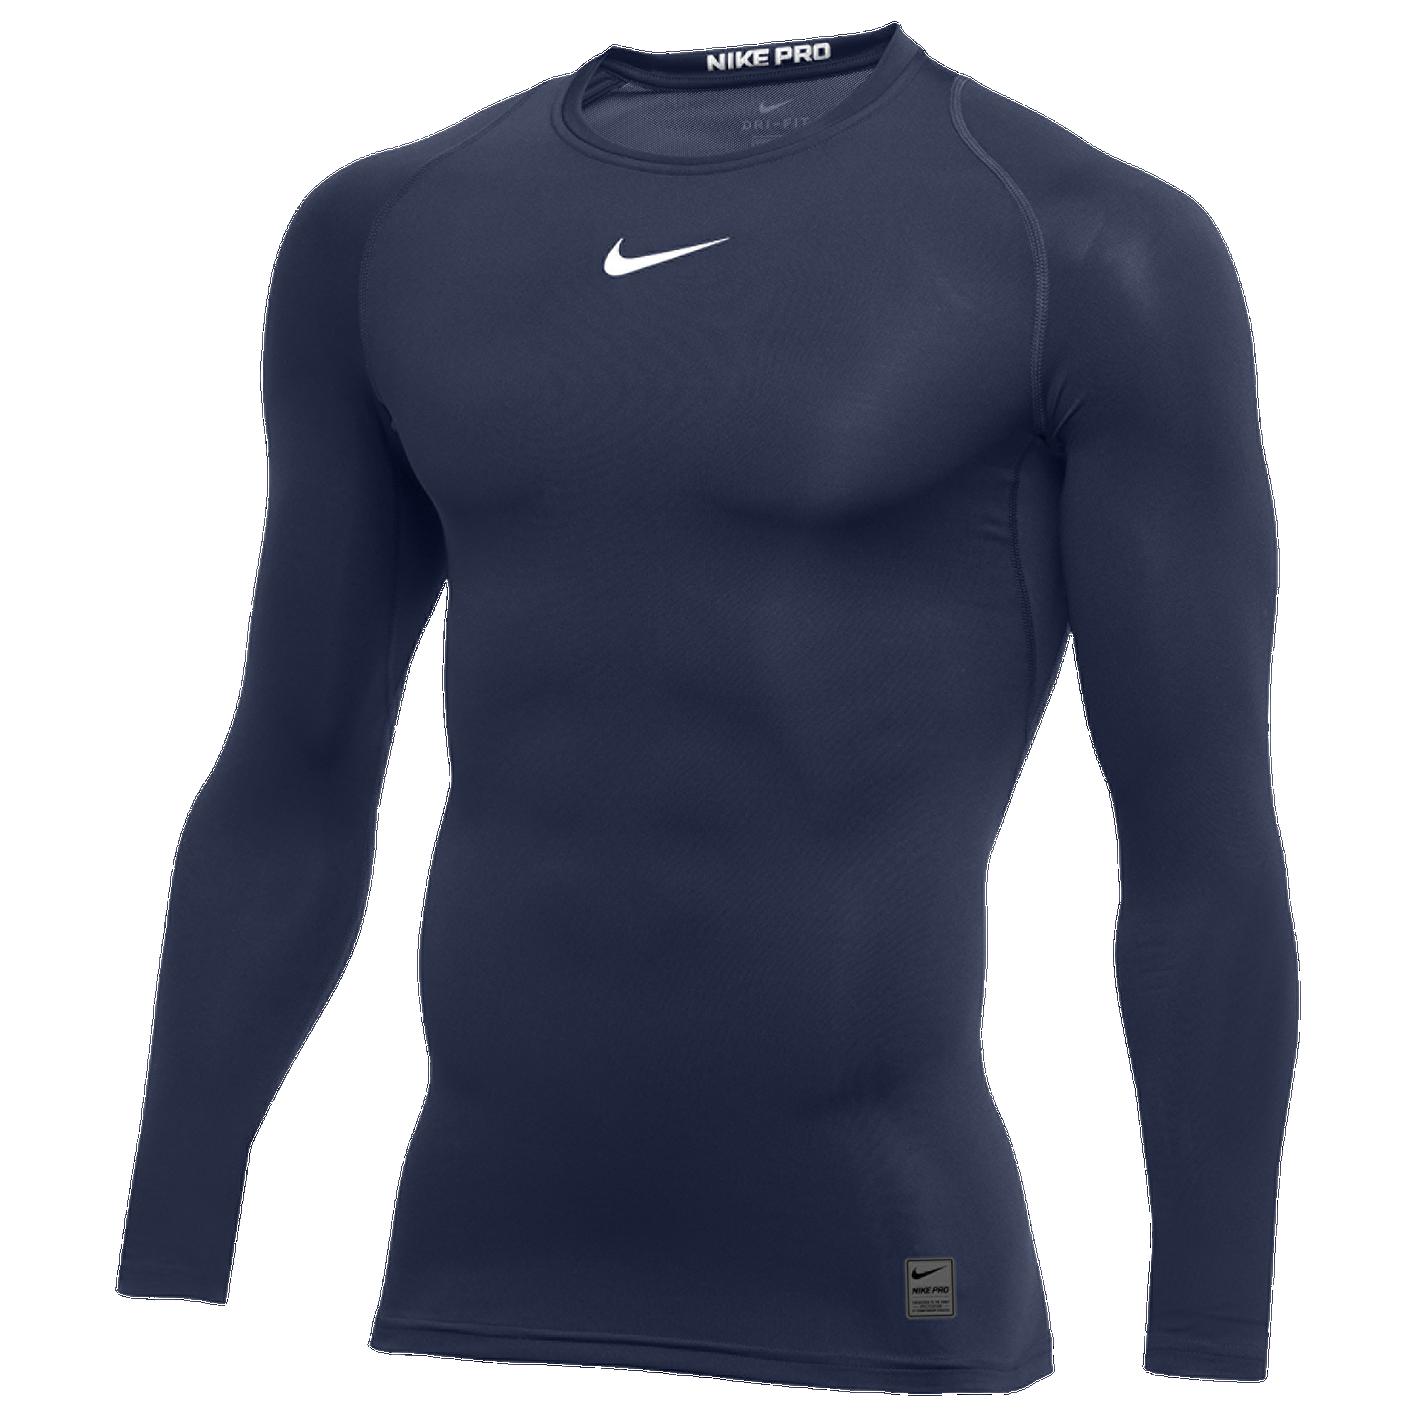 36dda6627 Nike Pro Long Sleeve Compression Top - Men's - Baseball - Clothing ...